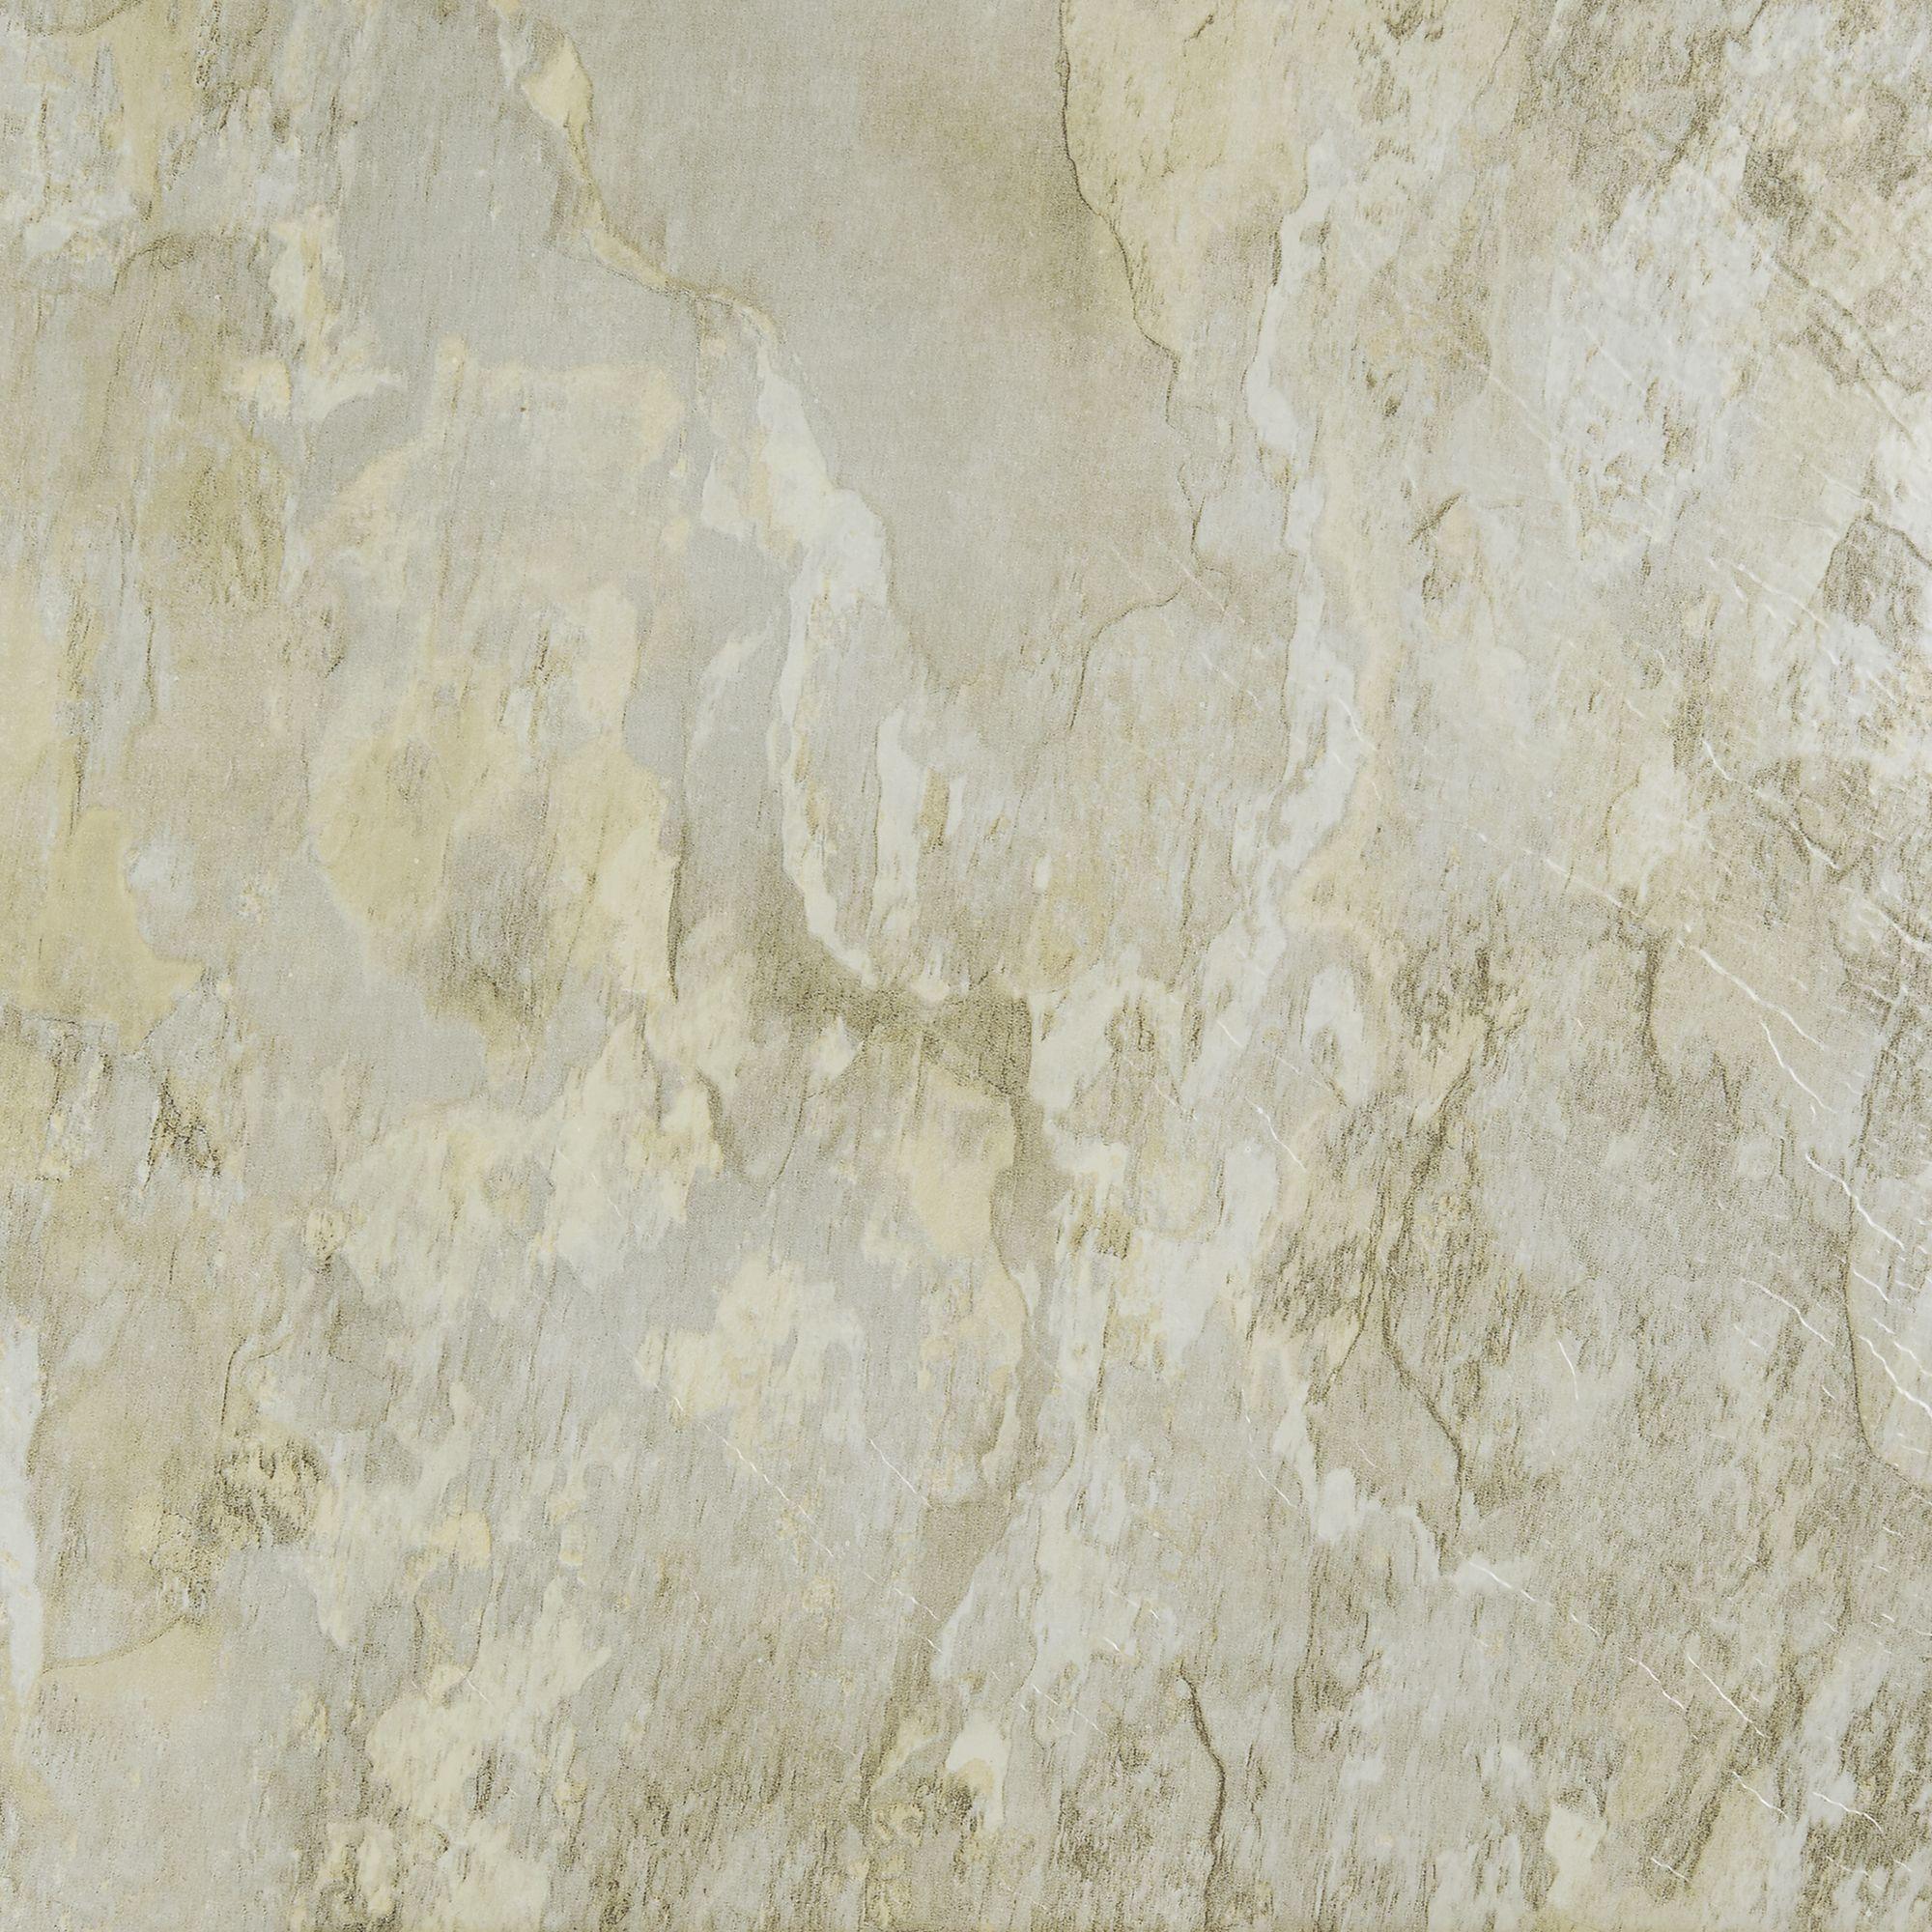 Achim Sterling Gray Marble 12x12 Self Adhesive Vinyl Floor Tile 20